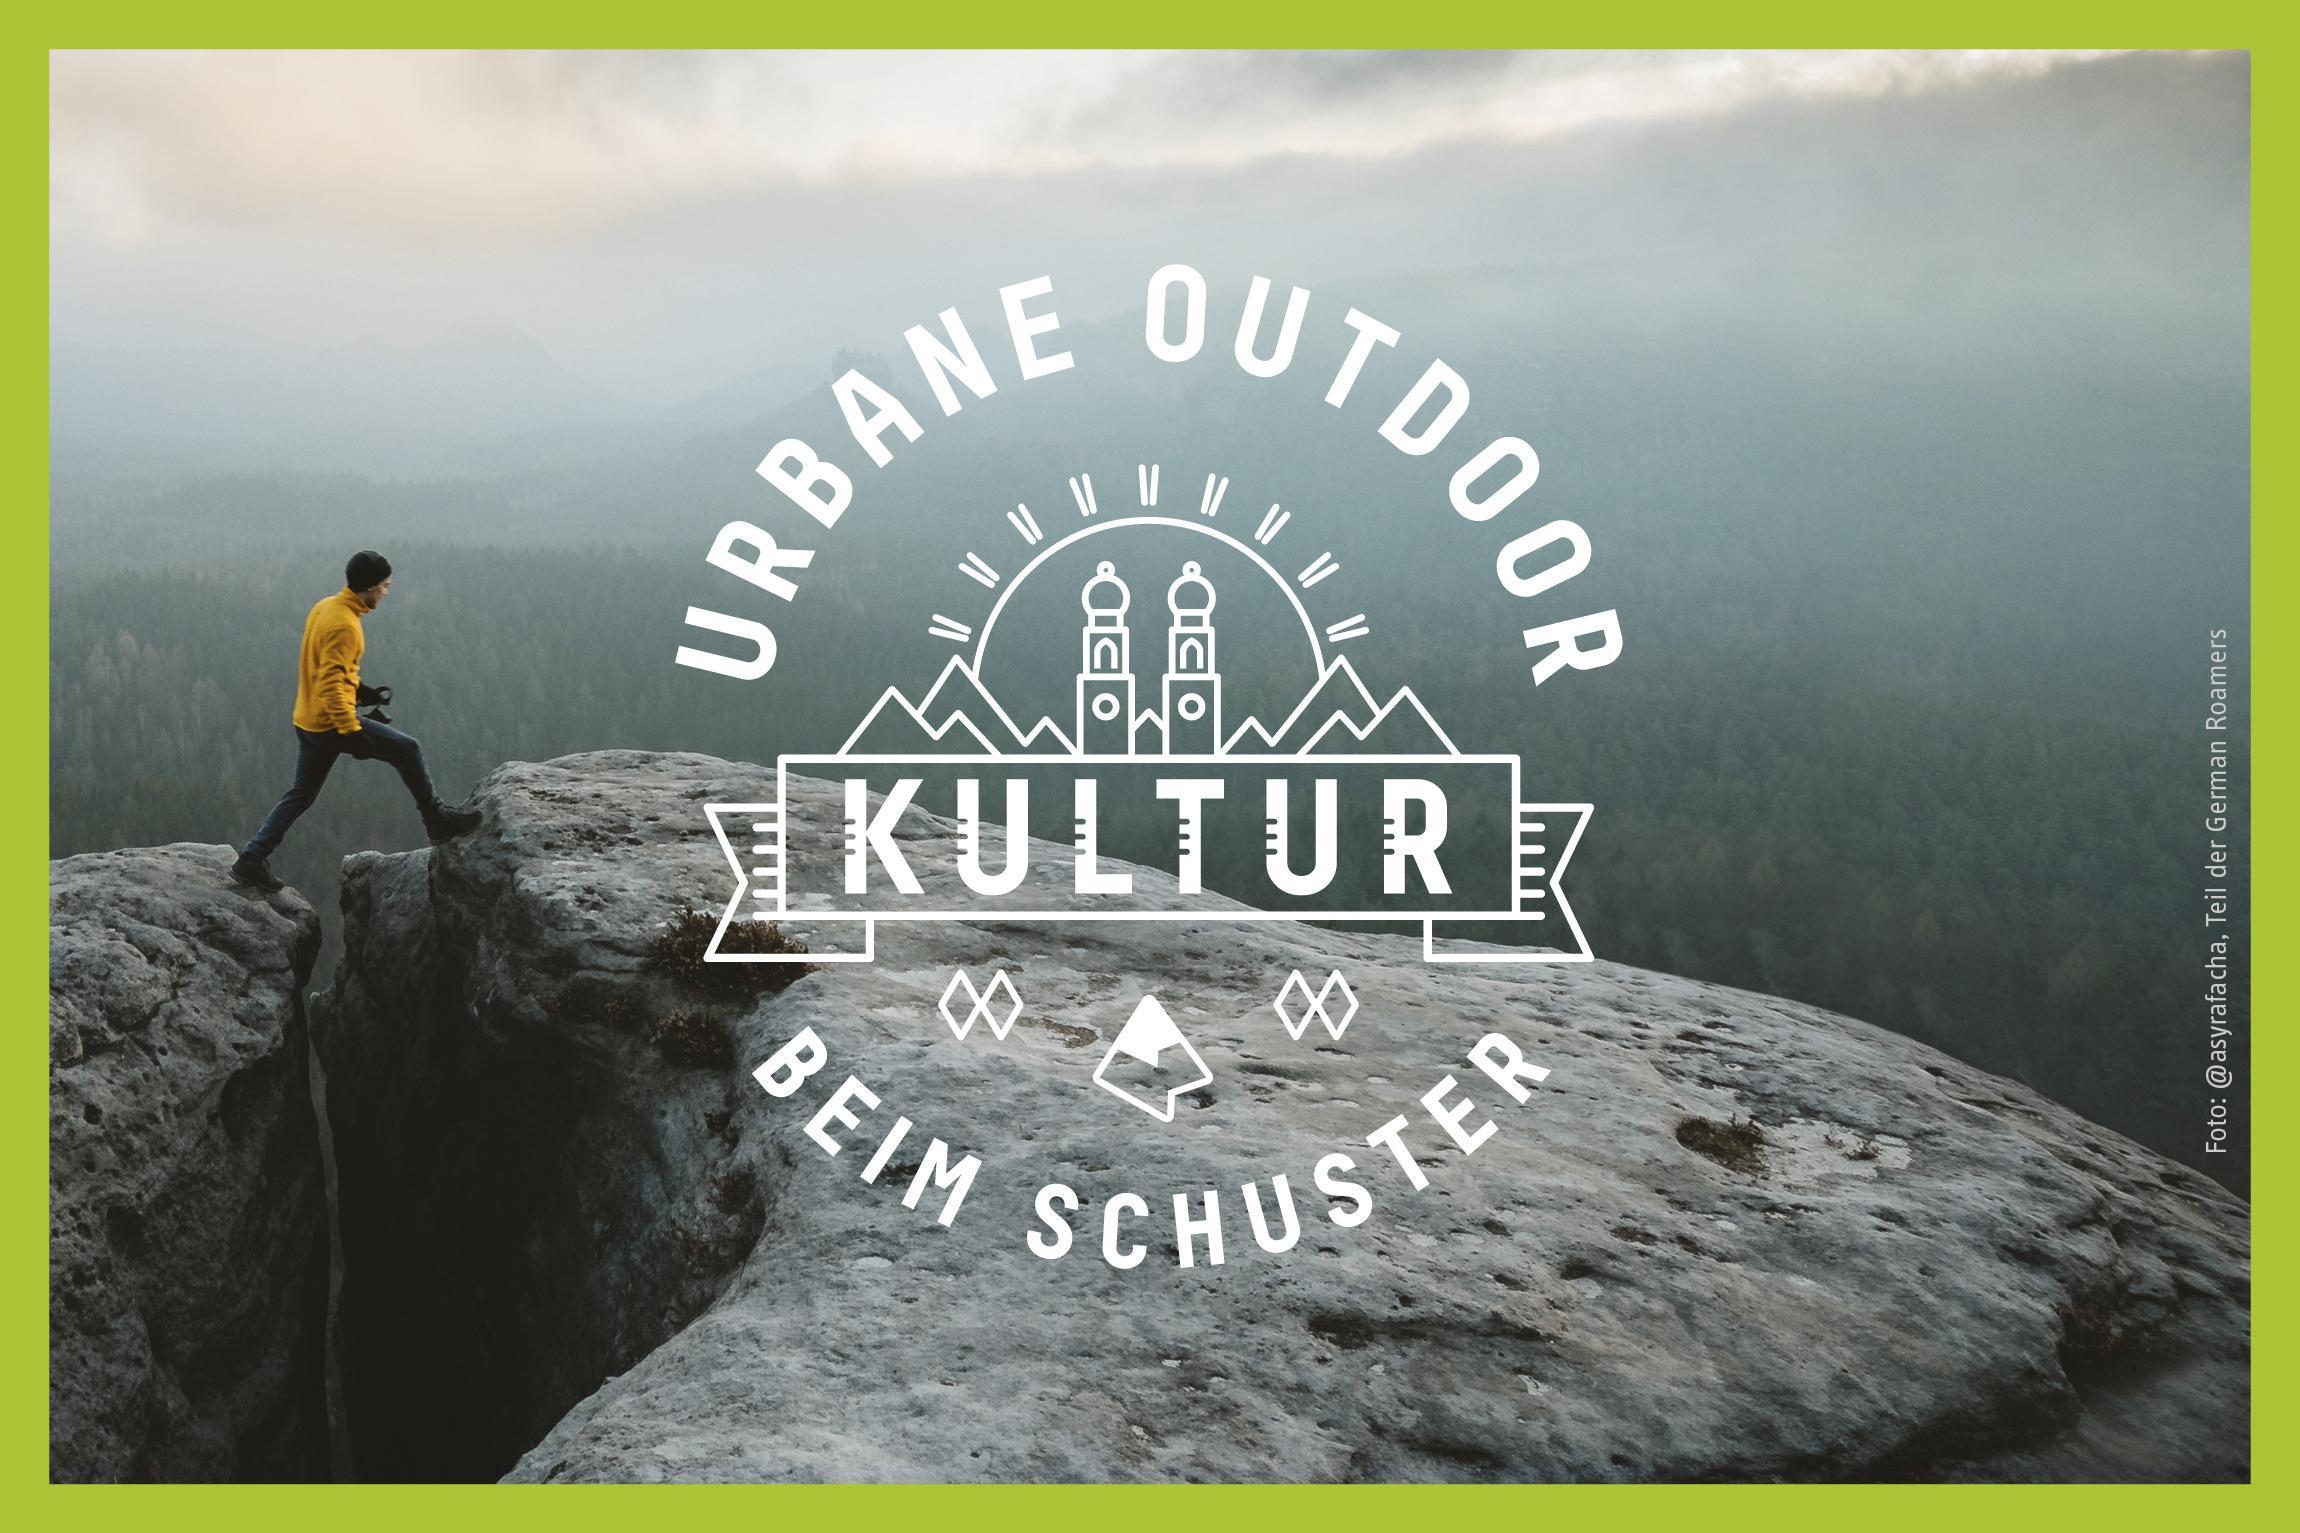 sporthaus_schuster_urban_outsider_kampagne_1.jpg Urbane Outdoor Kultur